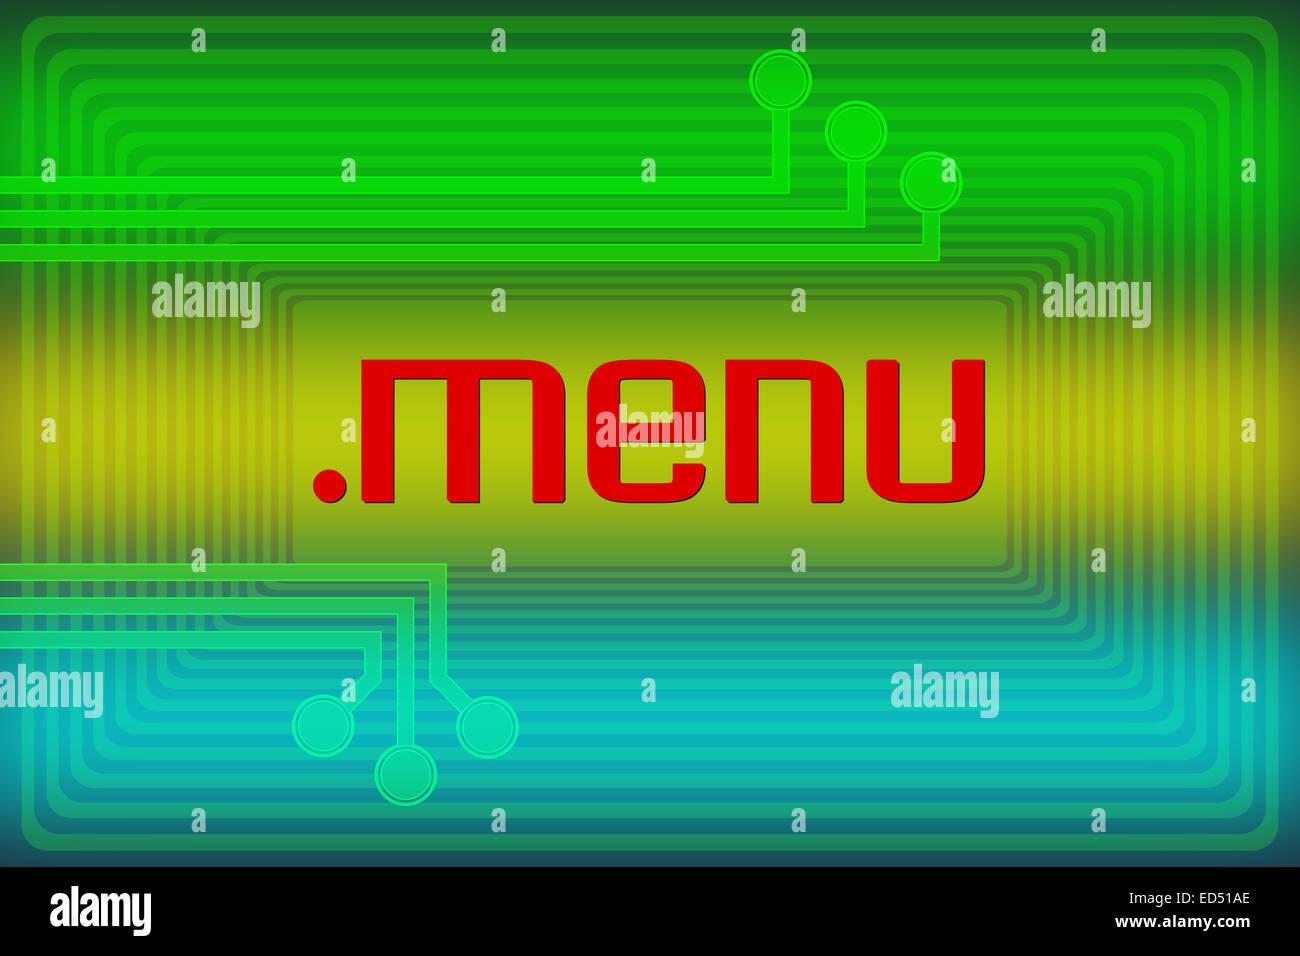 Darstellung der Internet-Adresse-Dot-Menü-Domain-Namen Stockbild